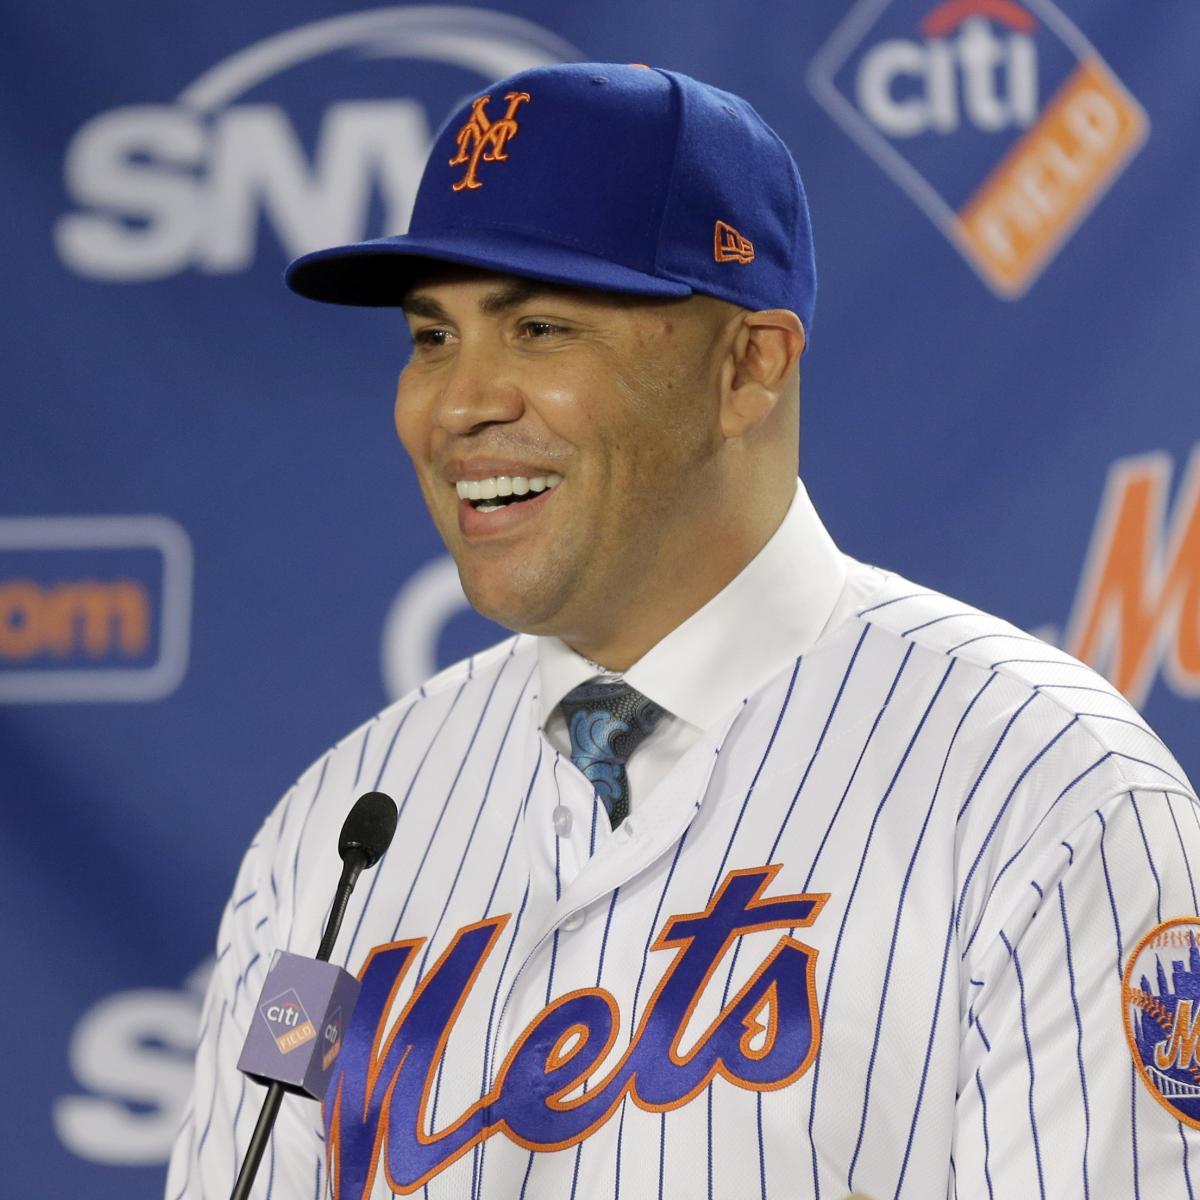 Mets Rumors Nym X27 Wavering X27 On Manager Carlos